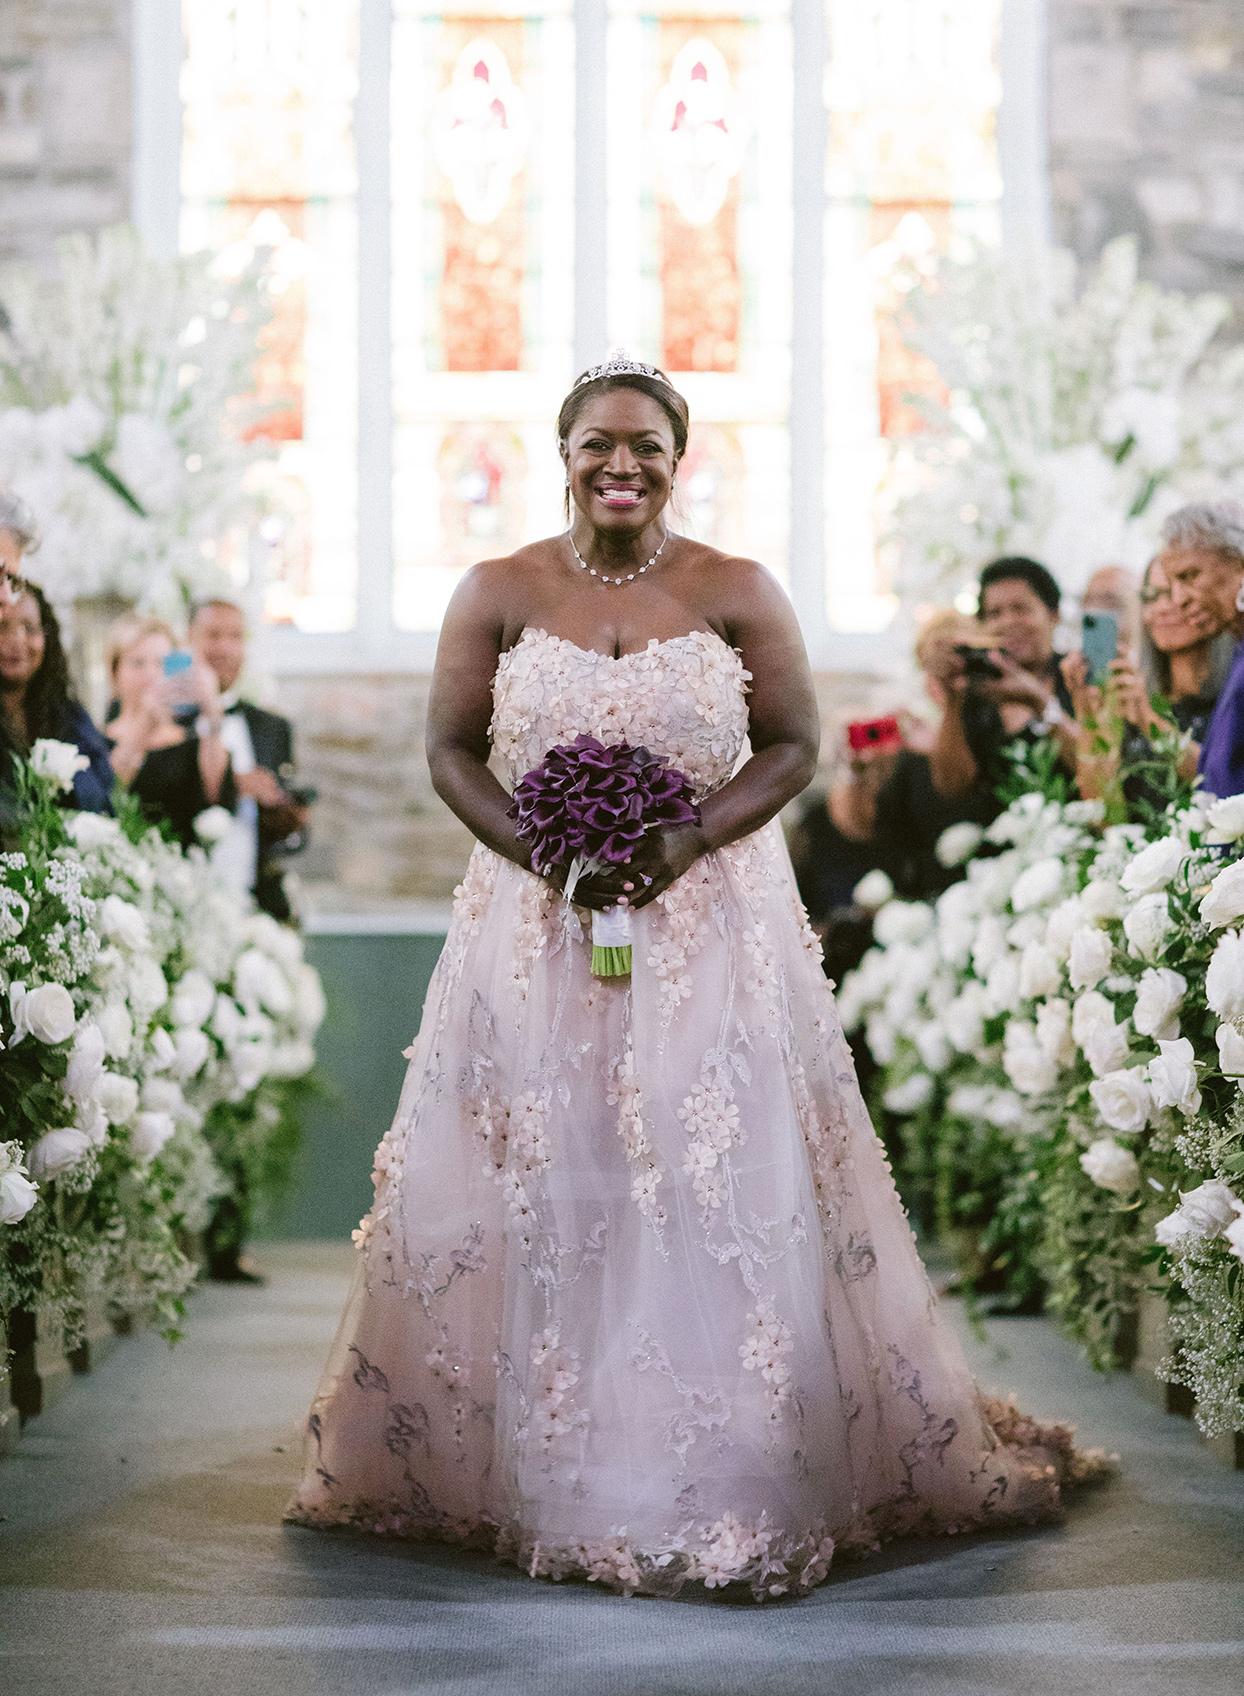 bride walking down aisle in pastel pink and purple floral wedding dress